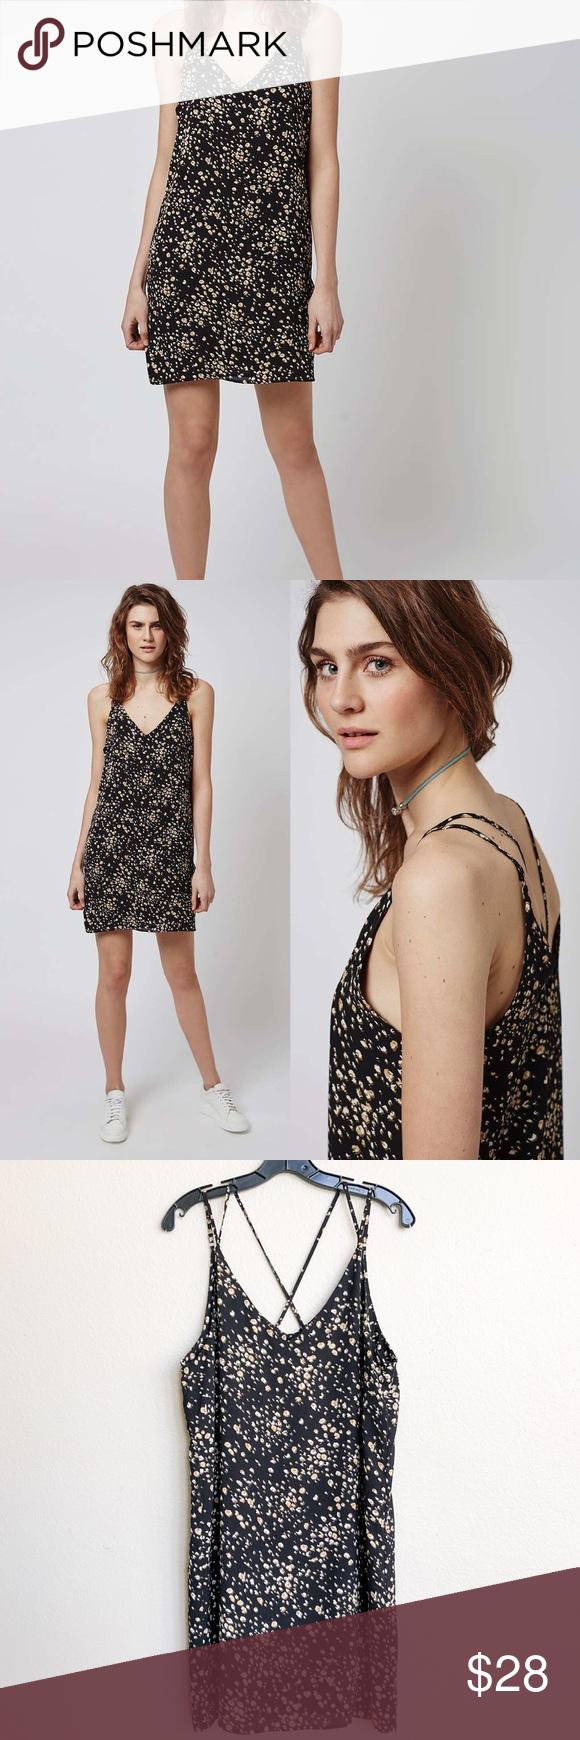 3813578e1df7 Leopard Bandeau Bikini Top | Topshop. Slip Dresses.